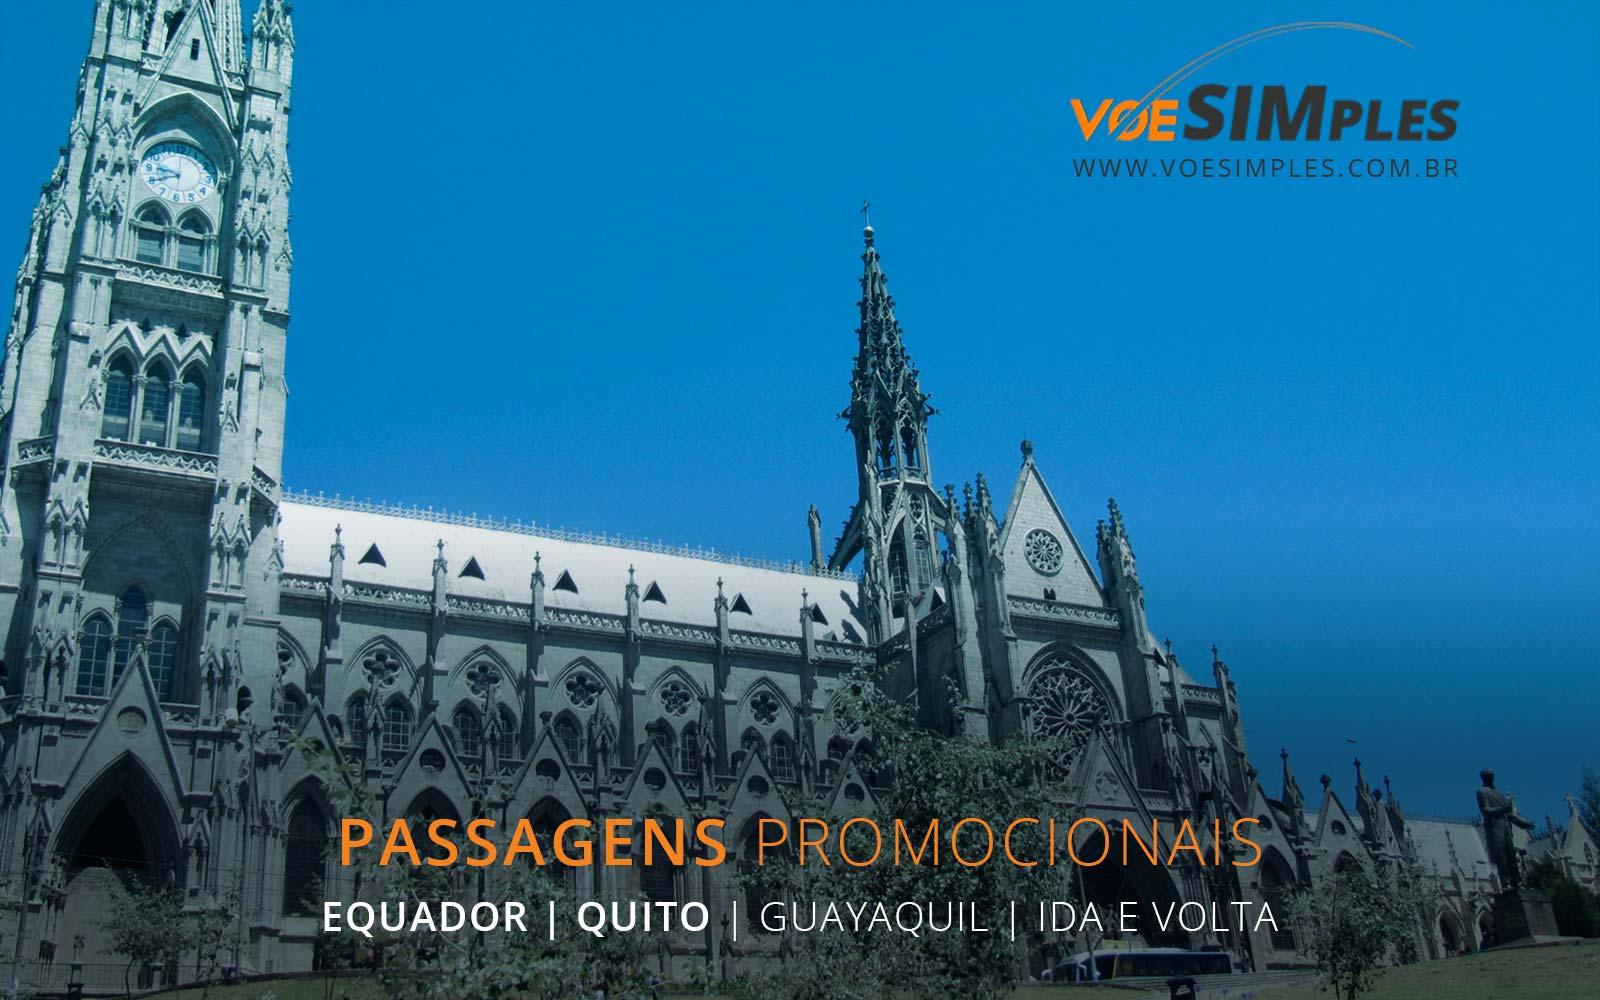 passagens-aerea-promocional-equador-voe-simples-passagens-aereas-baratas-promocao-passagem-aviao-passagens-aereas-brasil-quito-guayaquil-equador.jpg